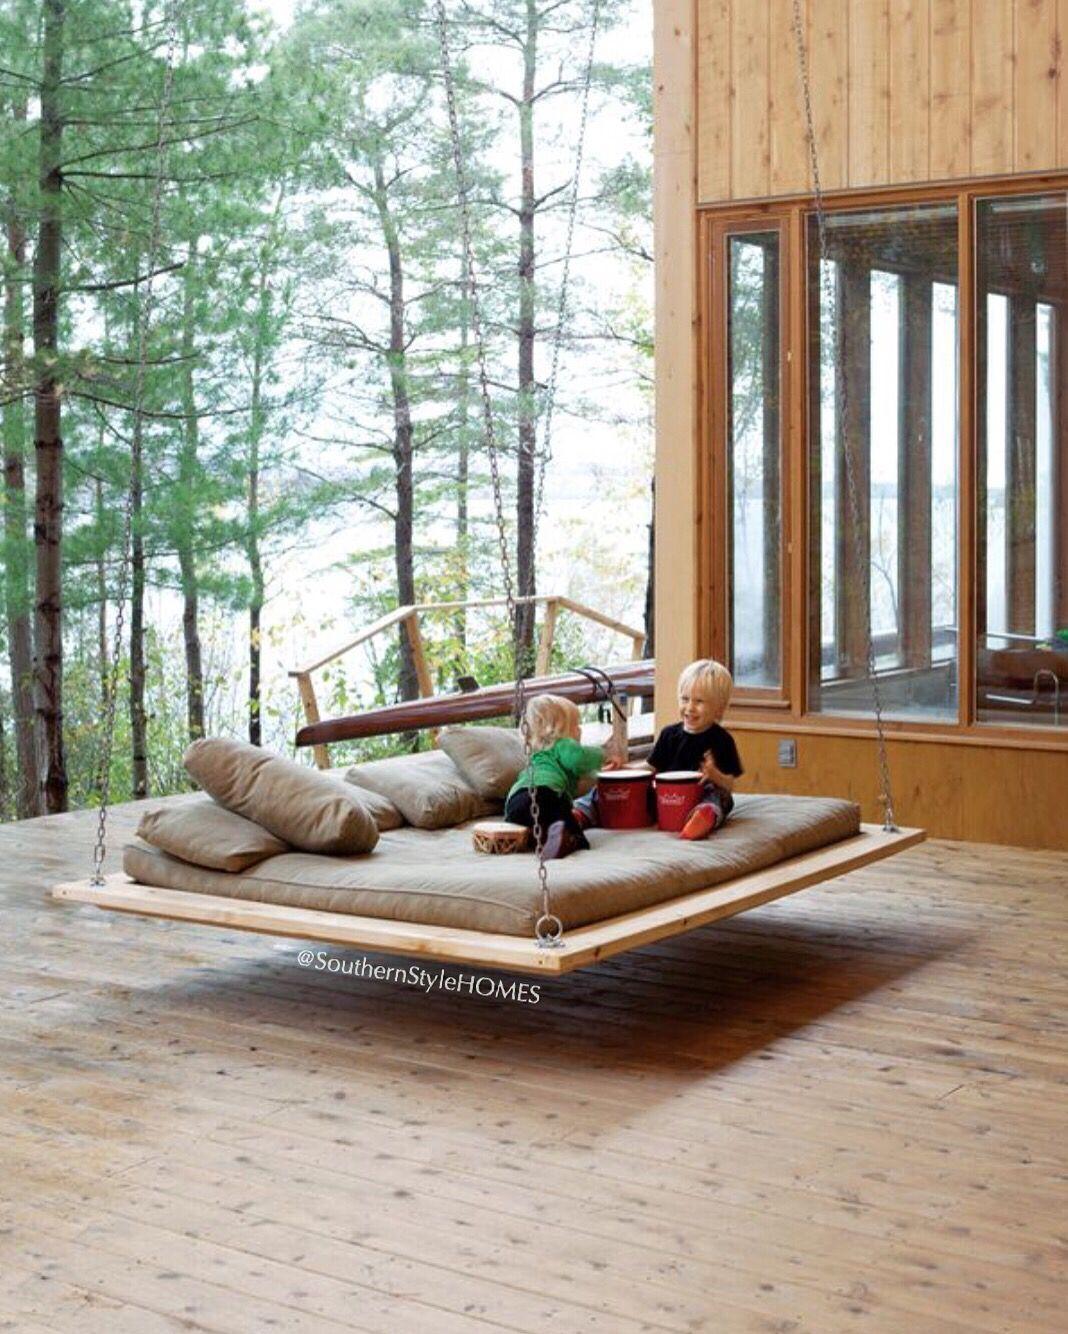 Luxury Designer Floating Bed For Garden Home Interior Design